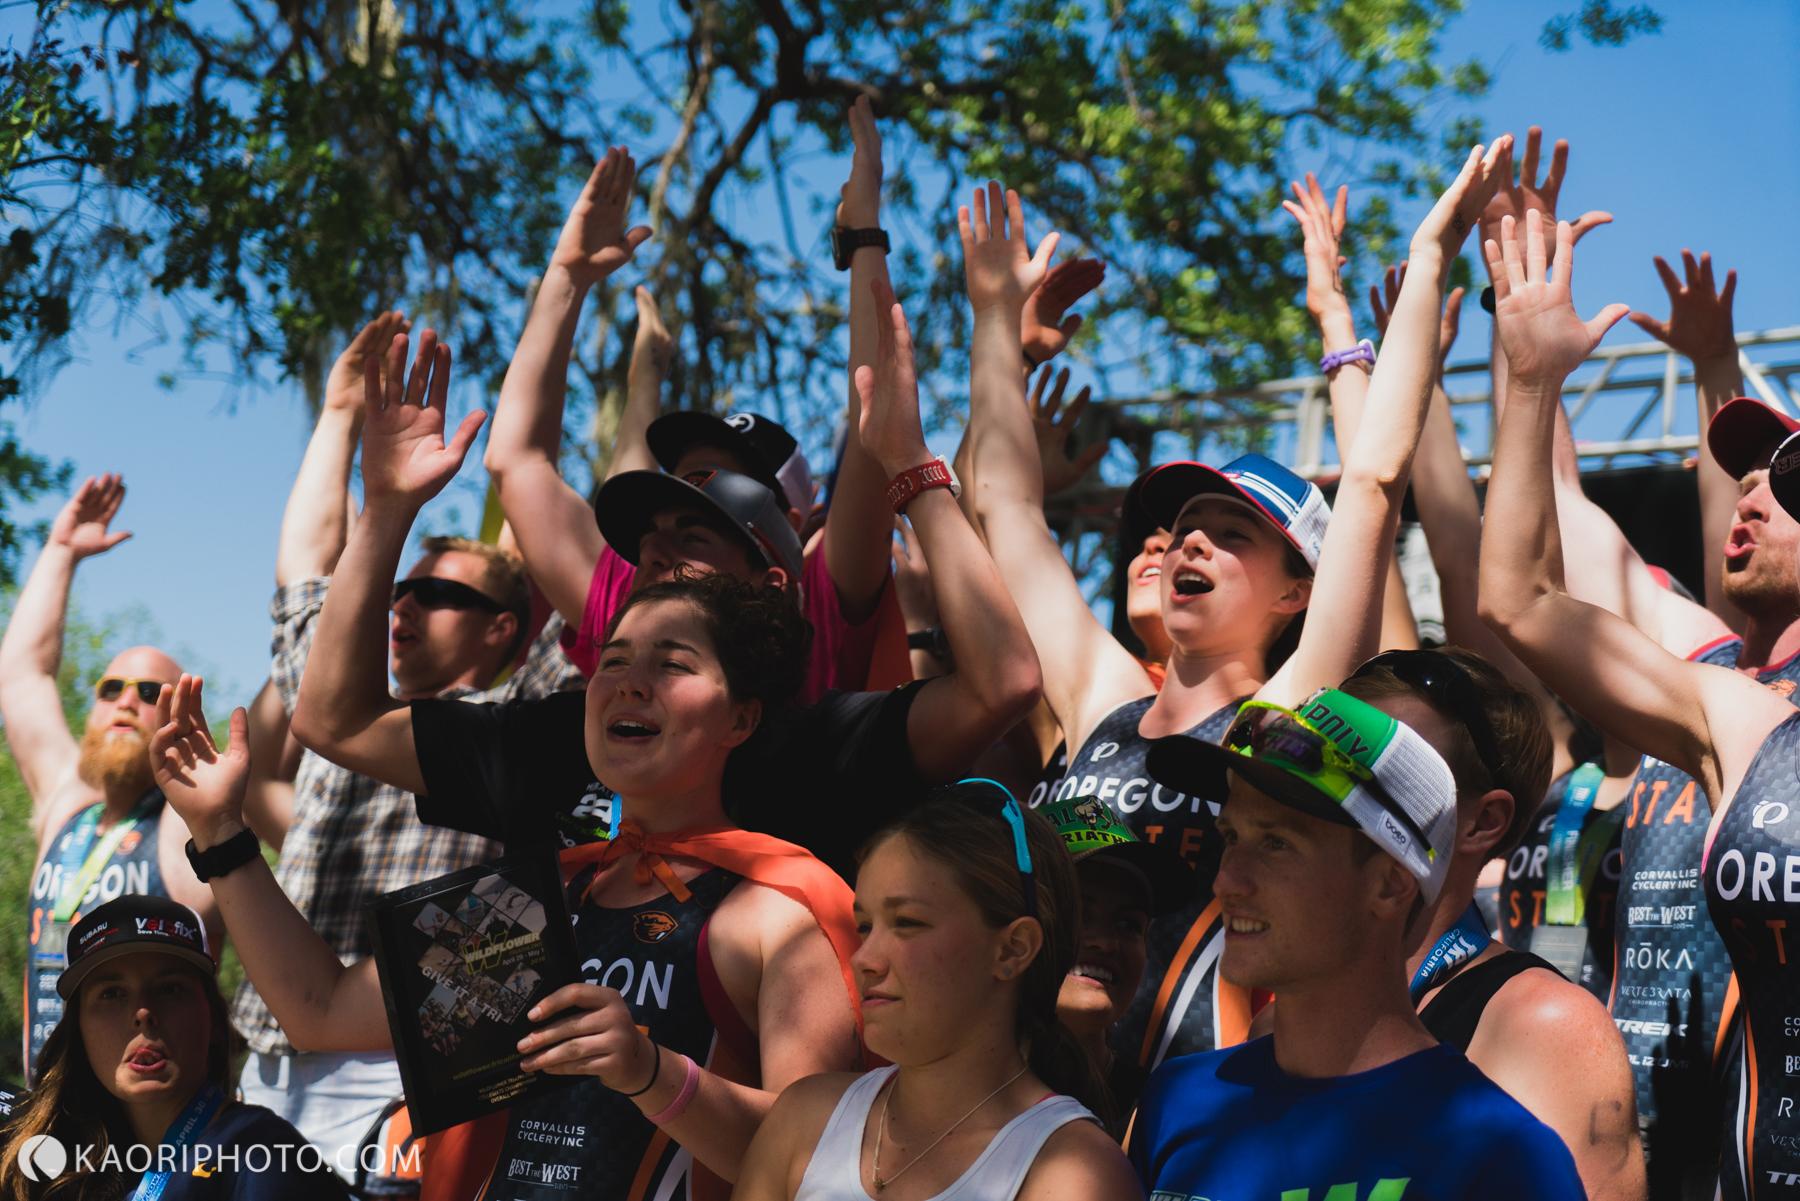 The Wildflower Triathlon Experience Announces Full Festival